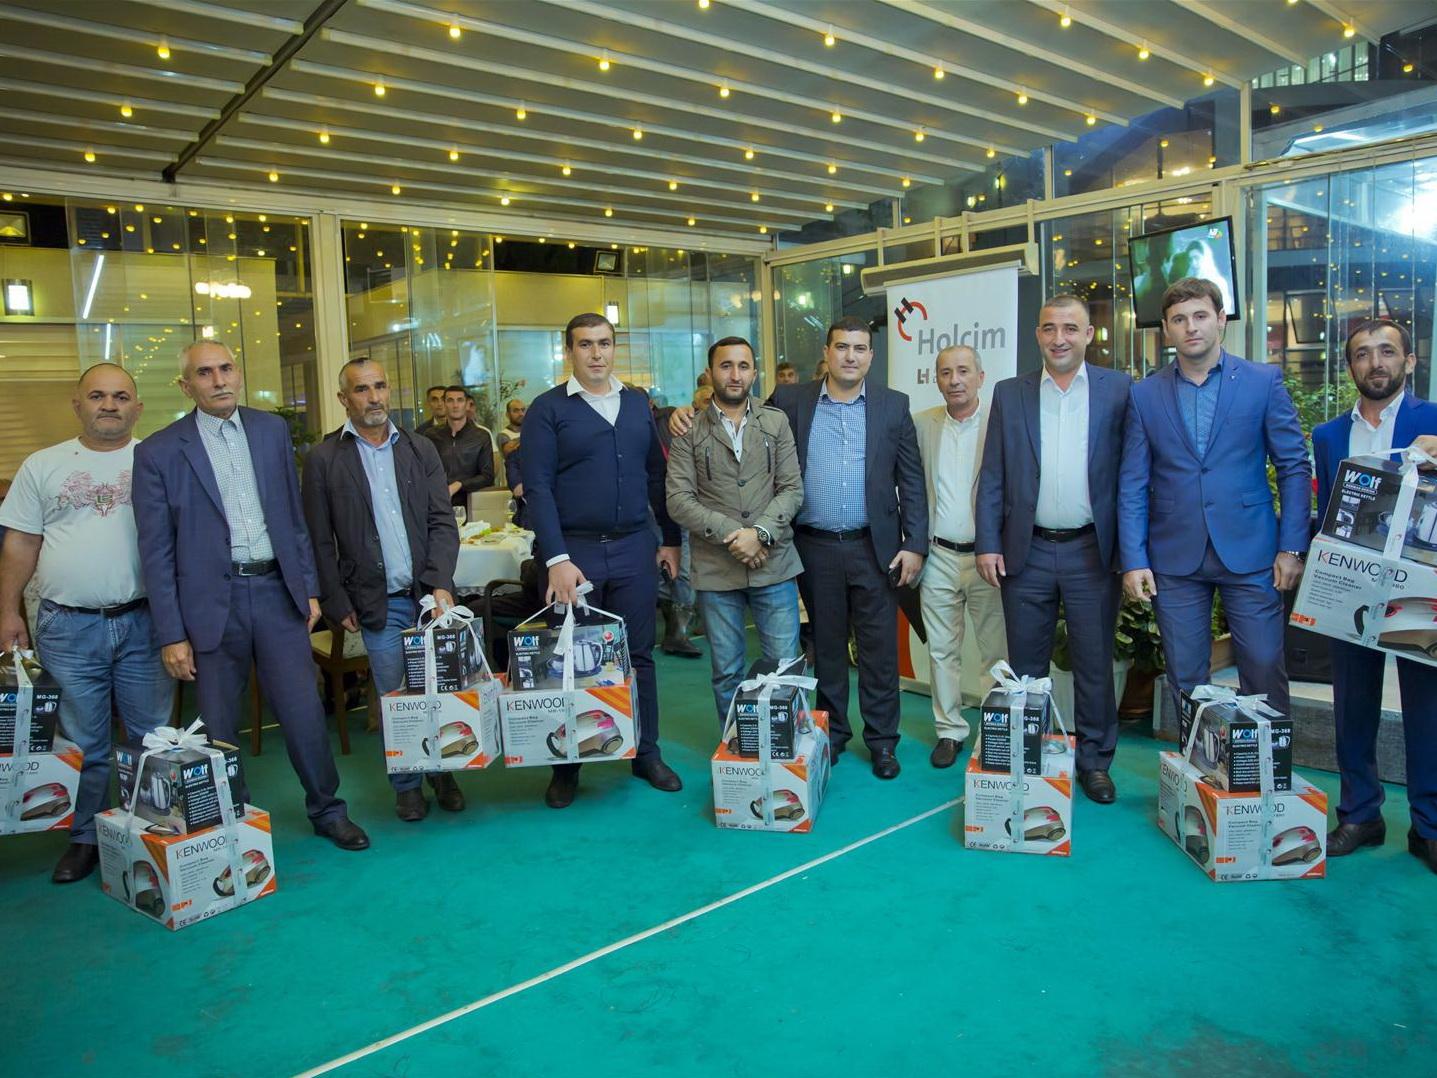 Holcim Azərbaycan организовал встречу с представителями по продаже цемента в регионах – ФОТО – ВИДЕО